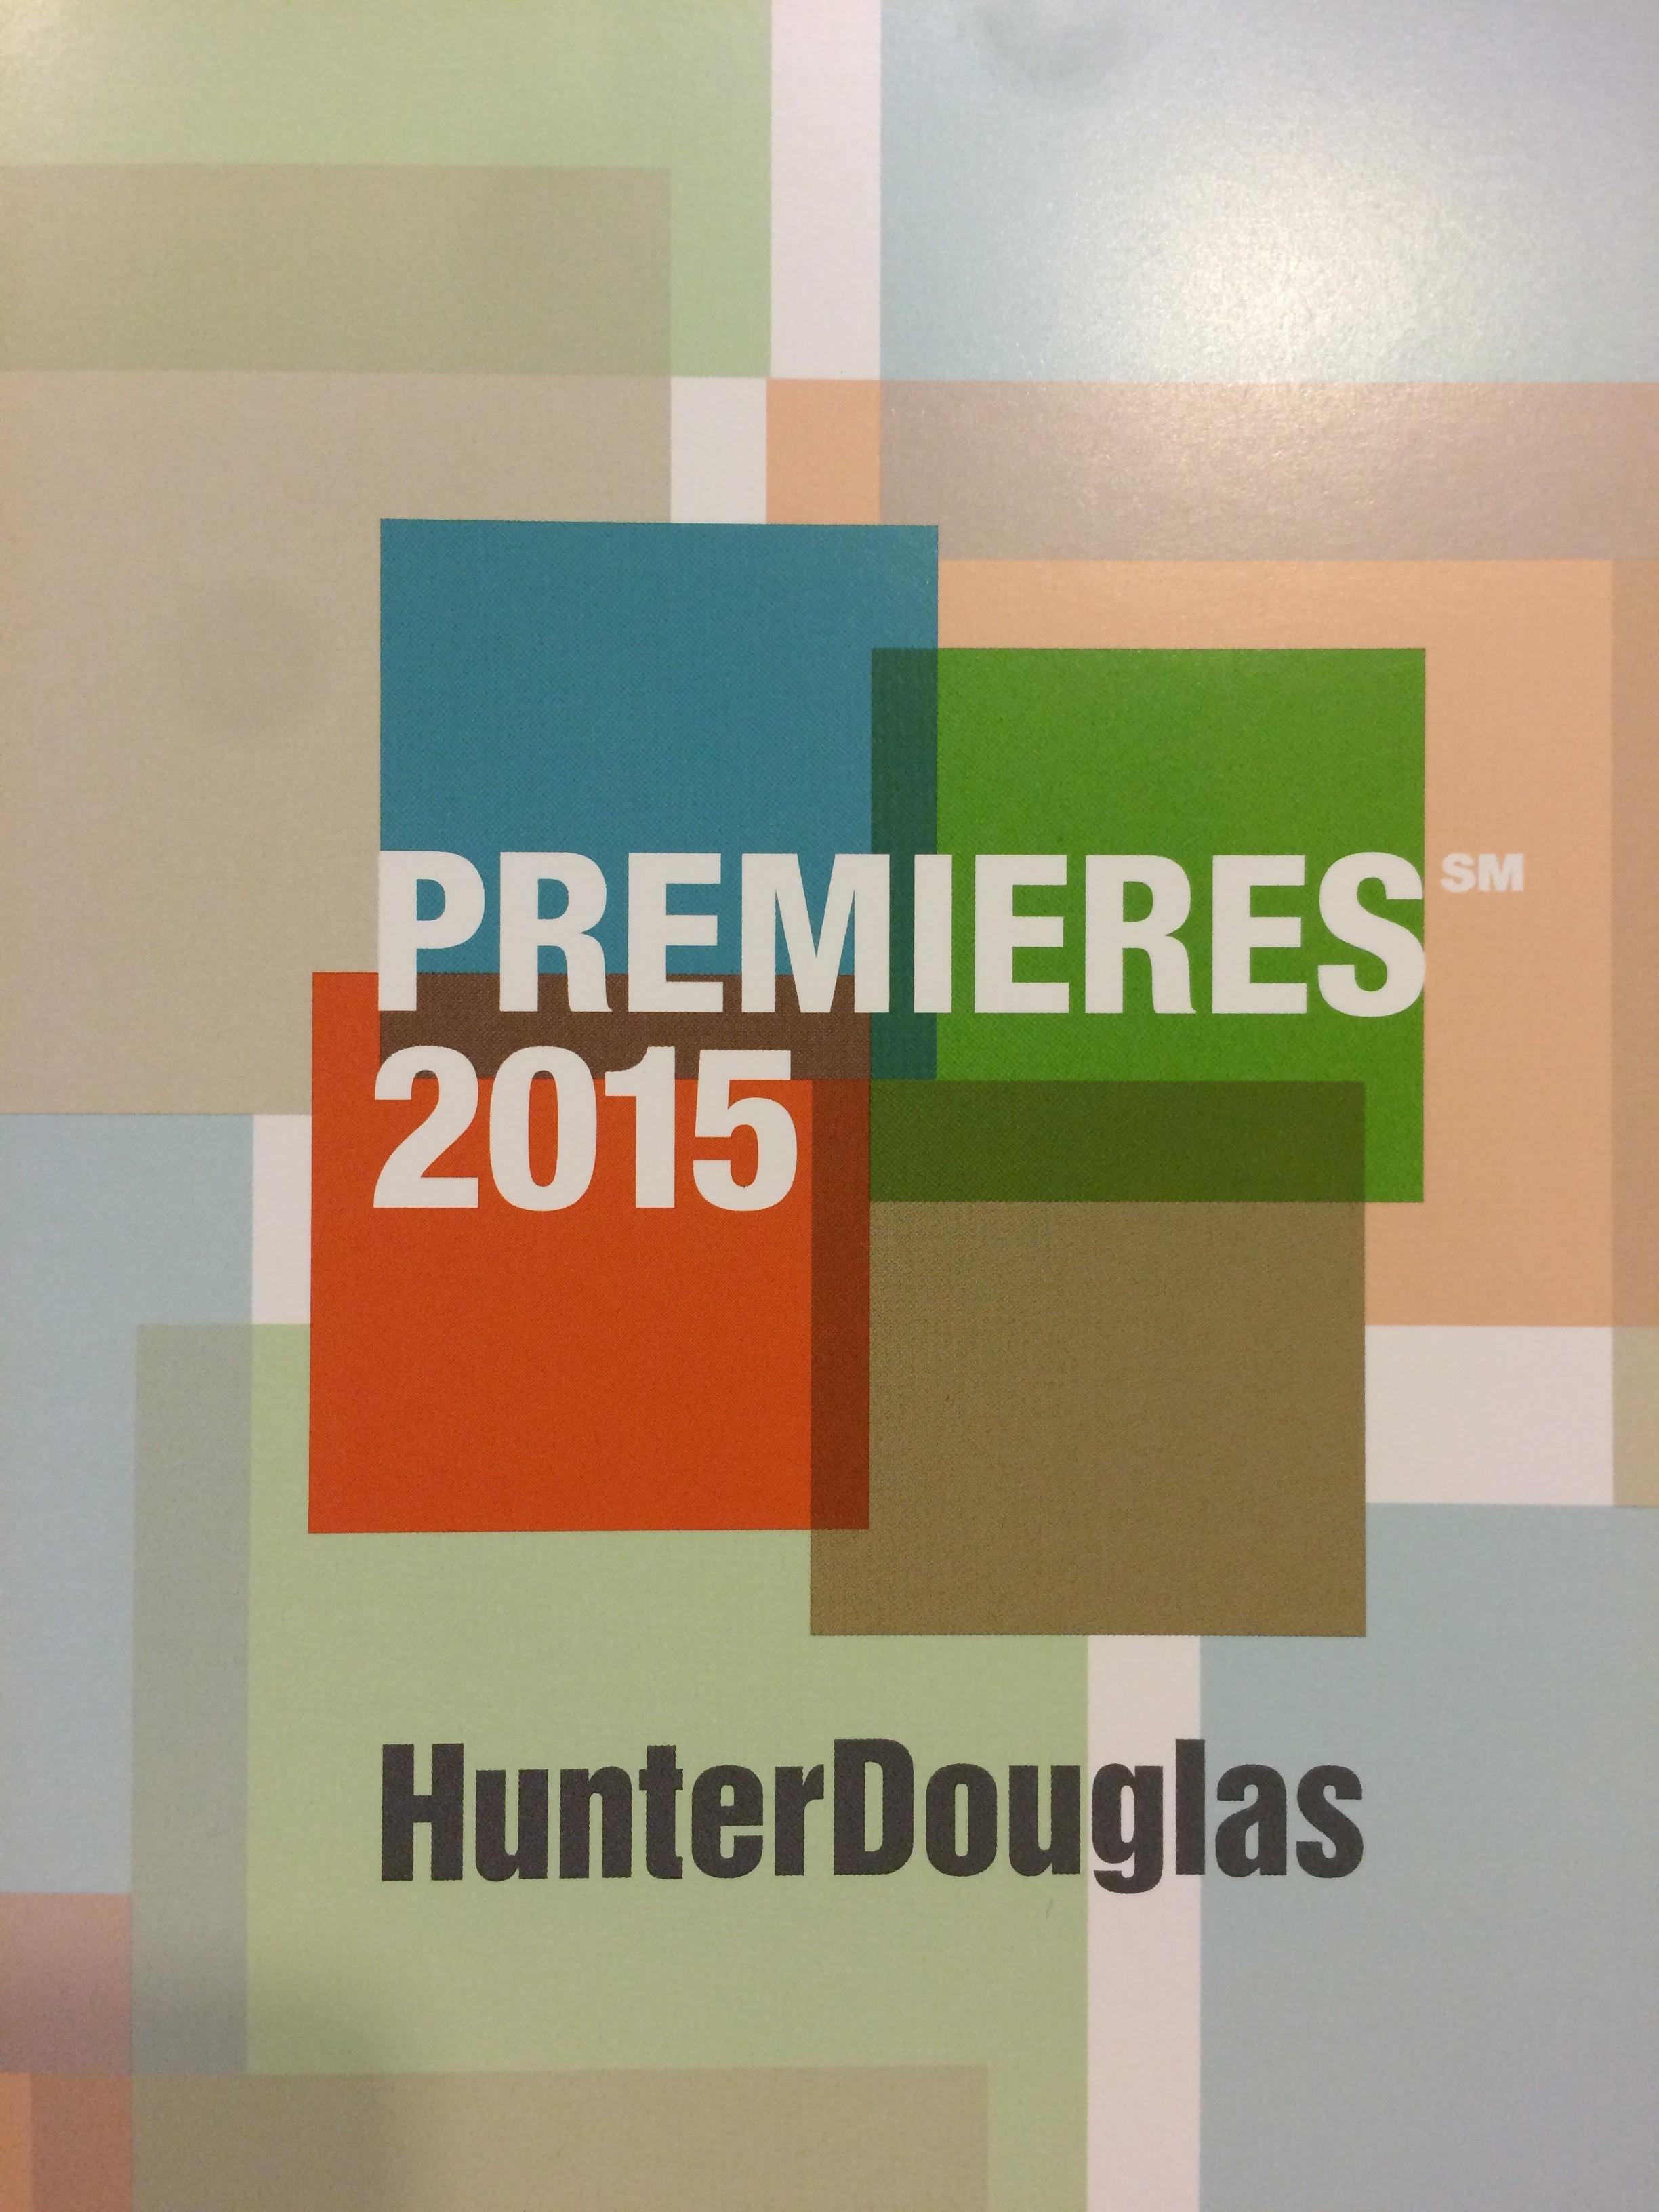 WINDOW TREATMENT VENDOR SPOTLIGHT: HUNTER DOUGLAS